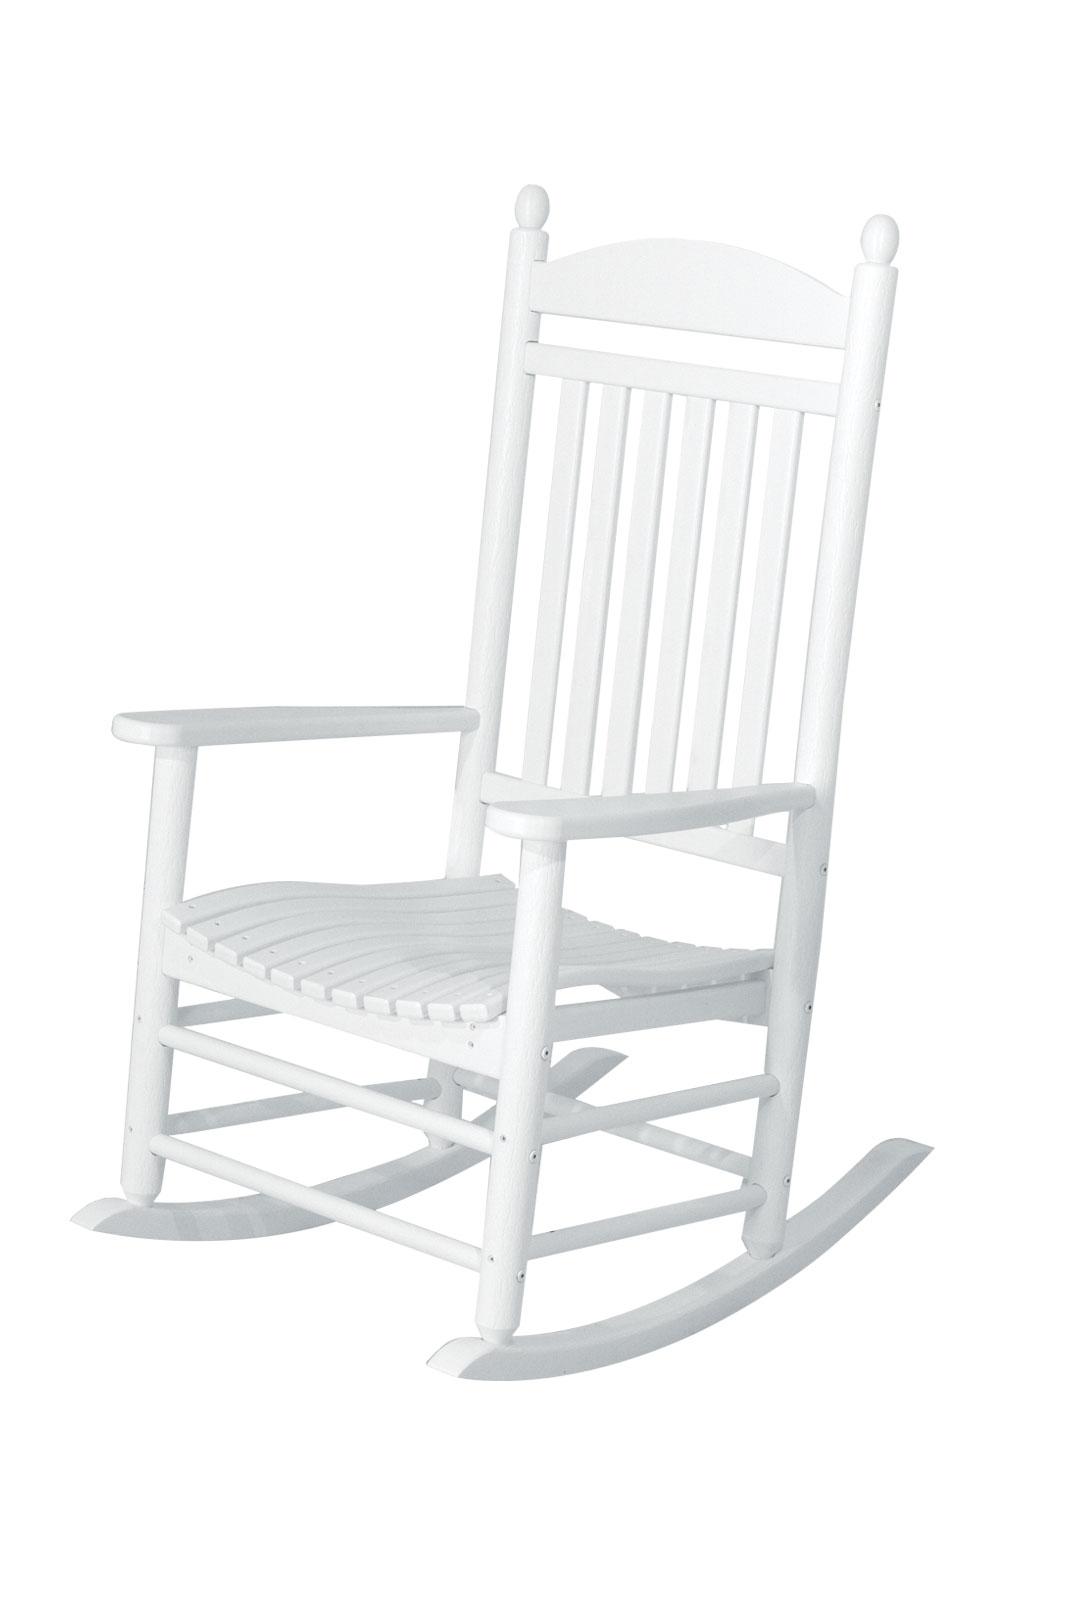 jefferson recycled plastic rocker chair  white